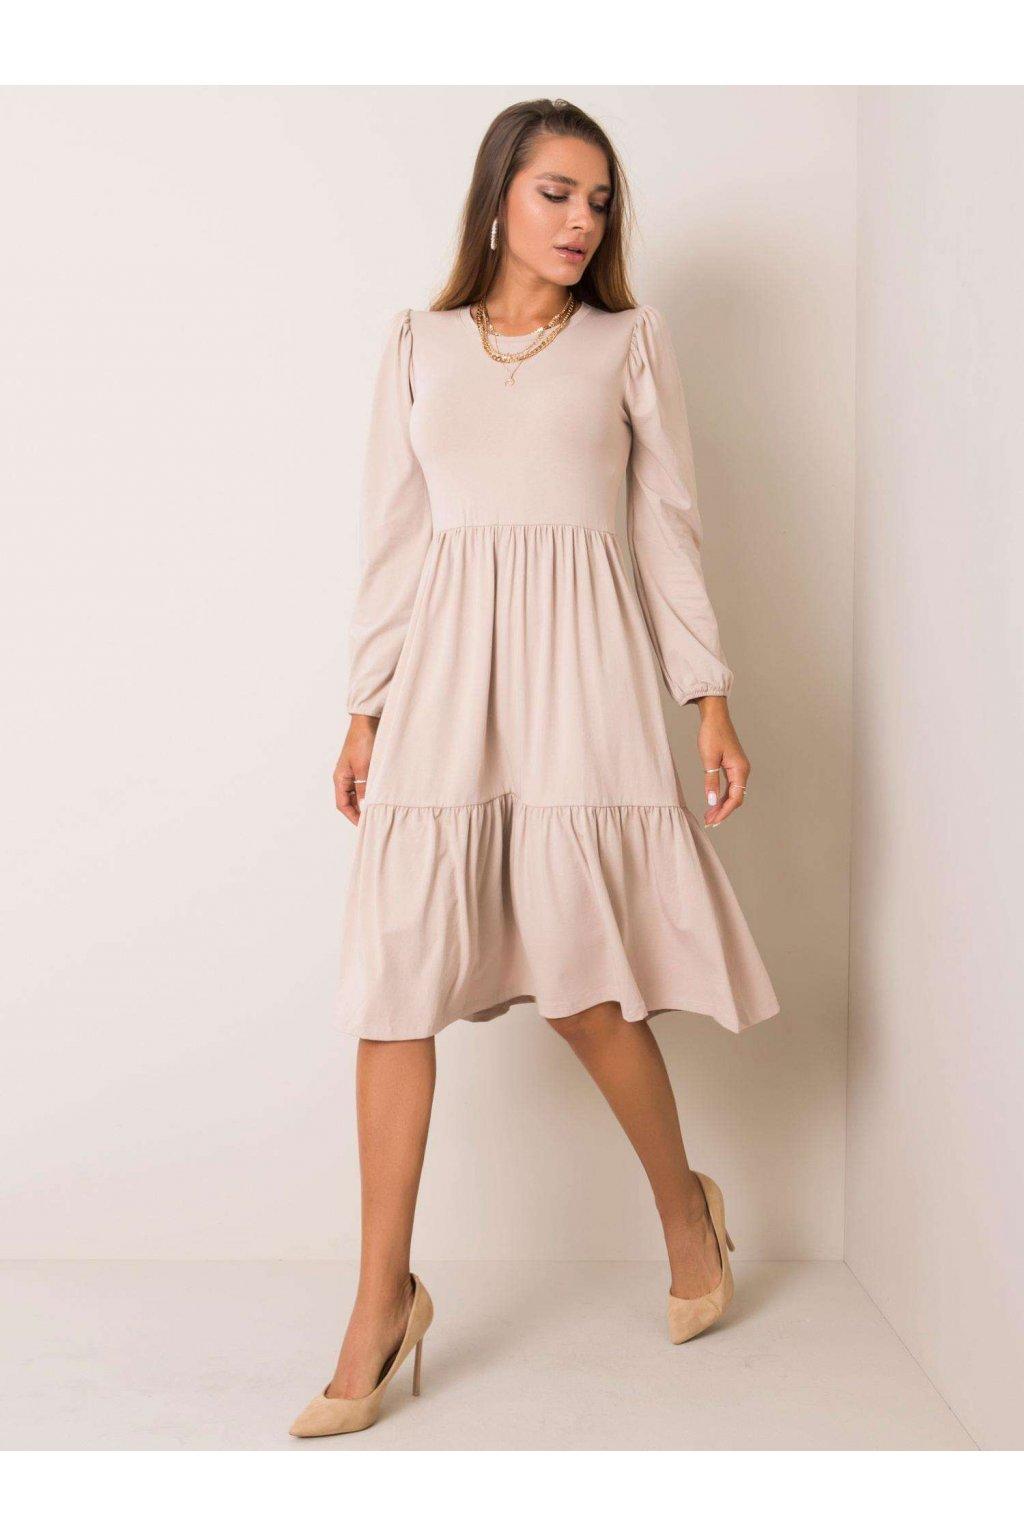 pol pl Bezowa sukienka Yonne RUE PARIS 354177 1